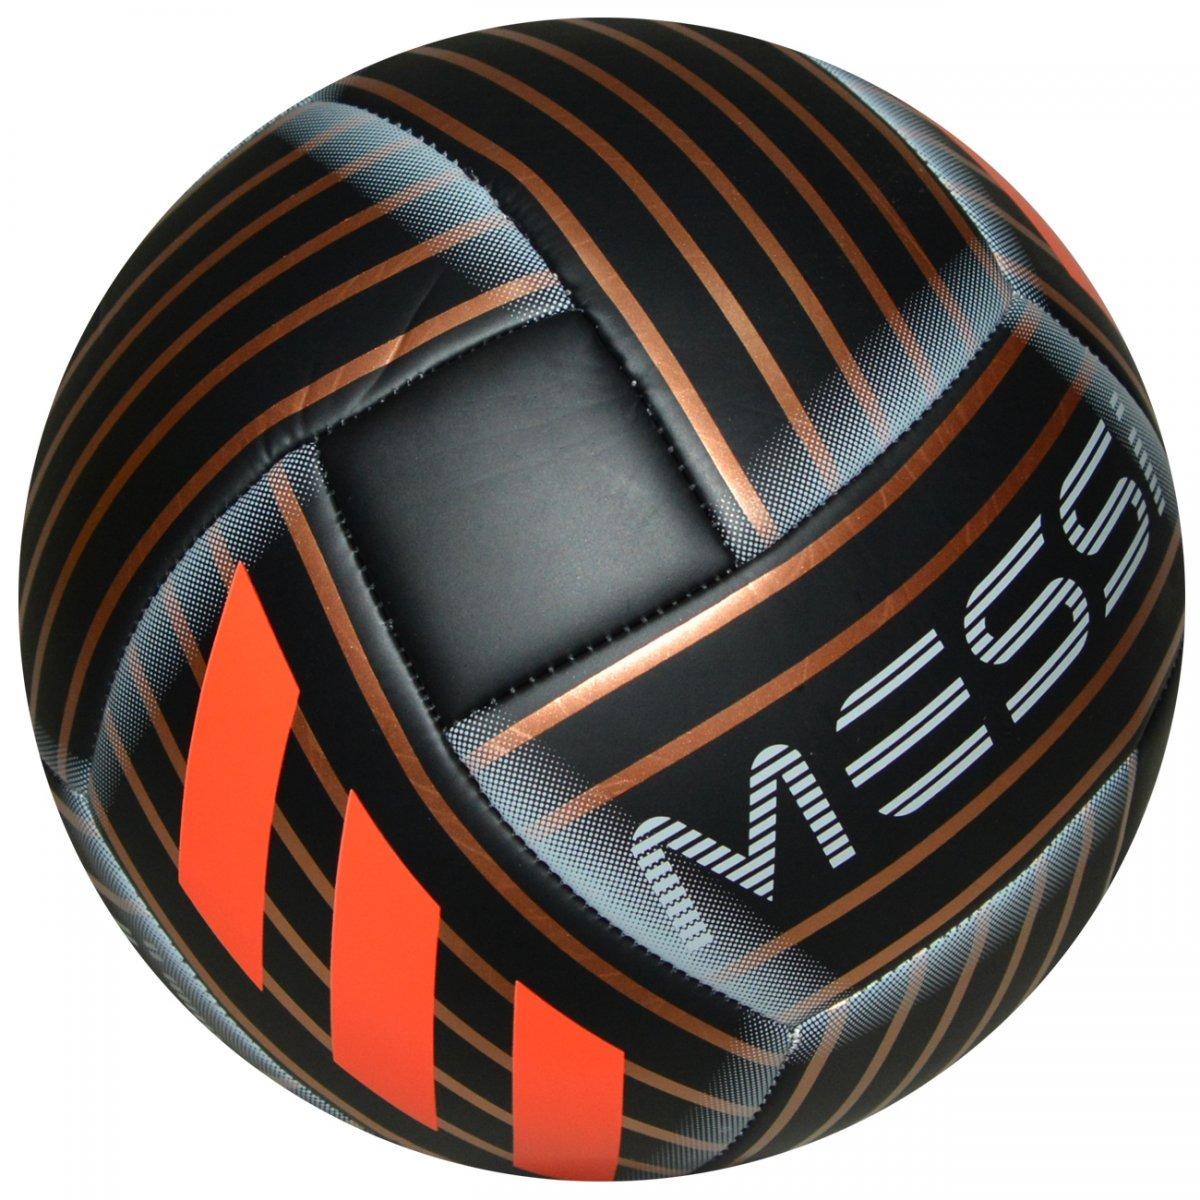 39a80668f8 Bola adidas Messi Q1